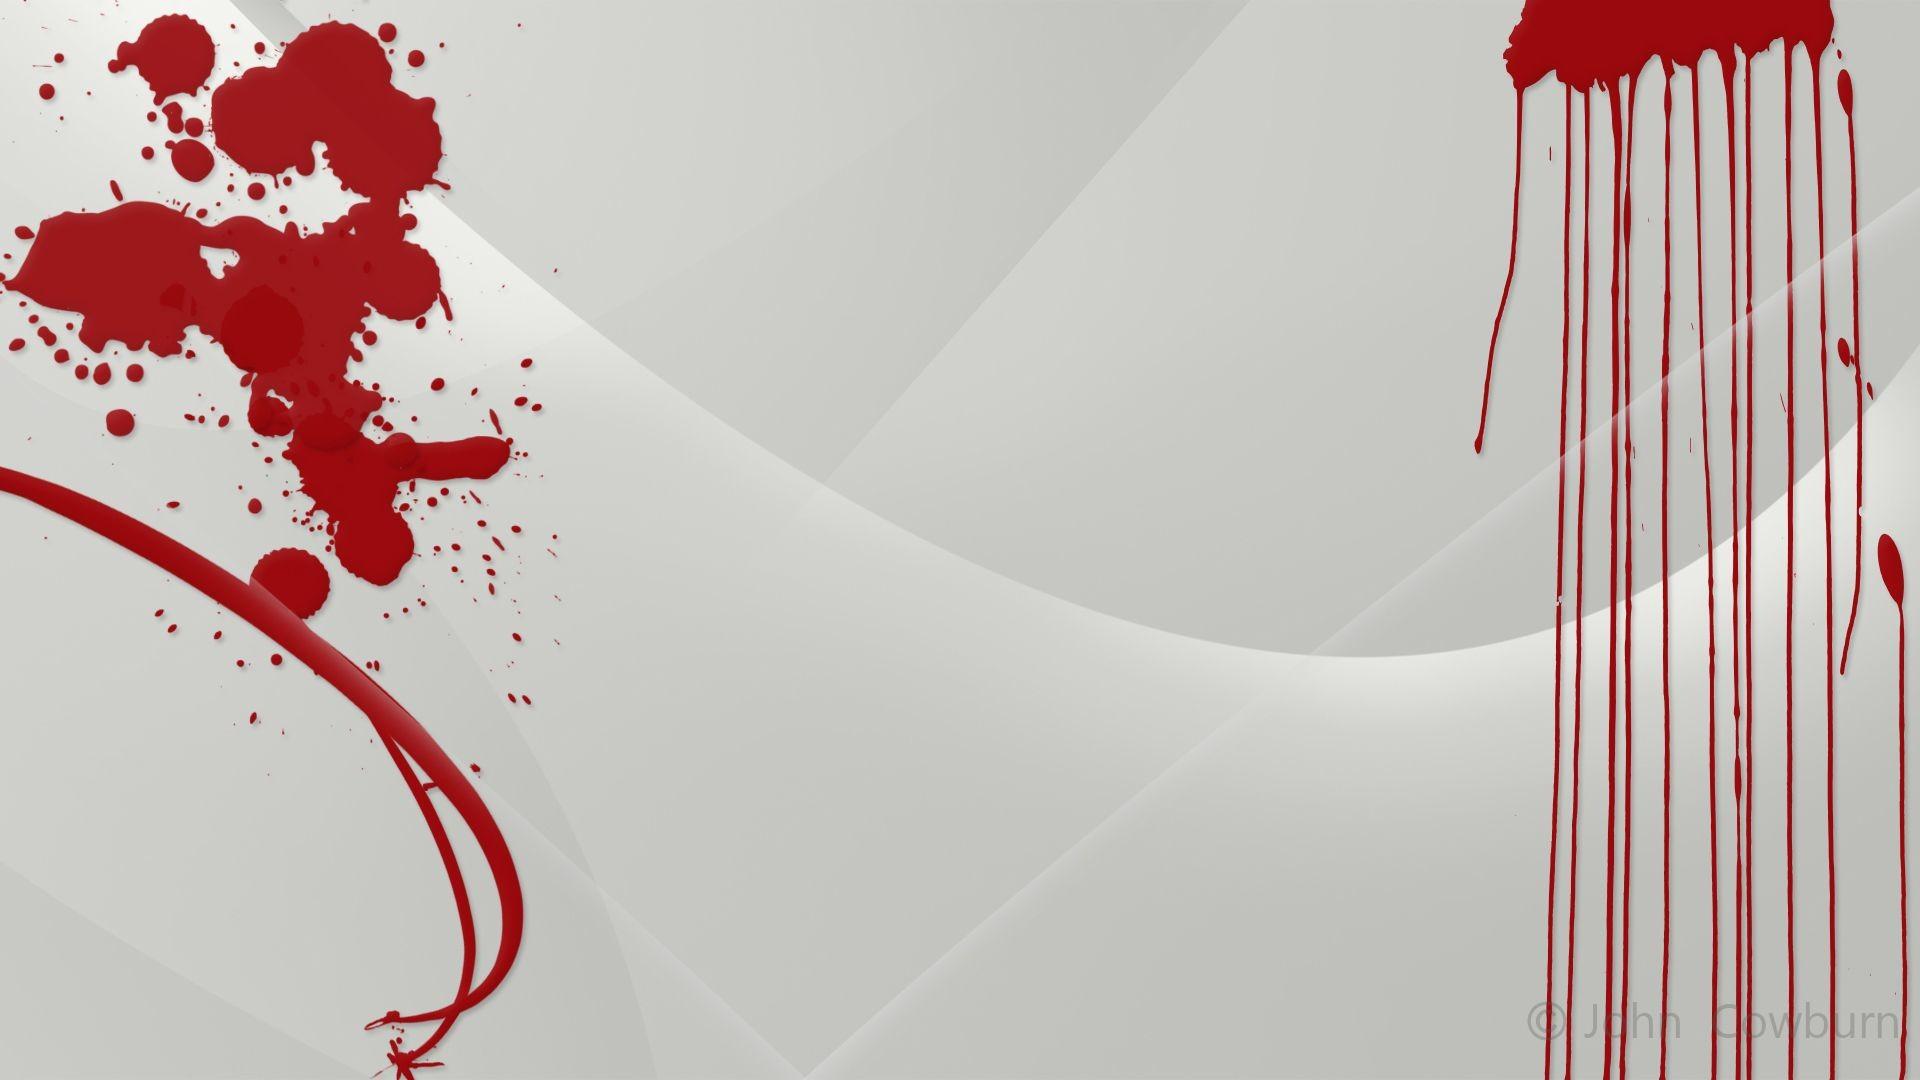 … Full HD 1080p Dexter Wallpapers HD, Desktop Backgrounds …